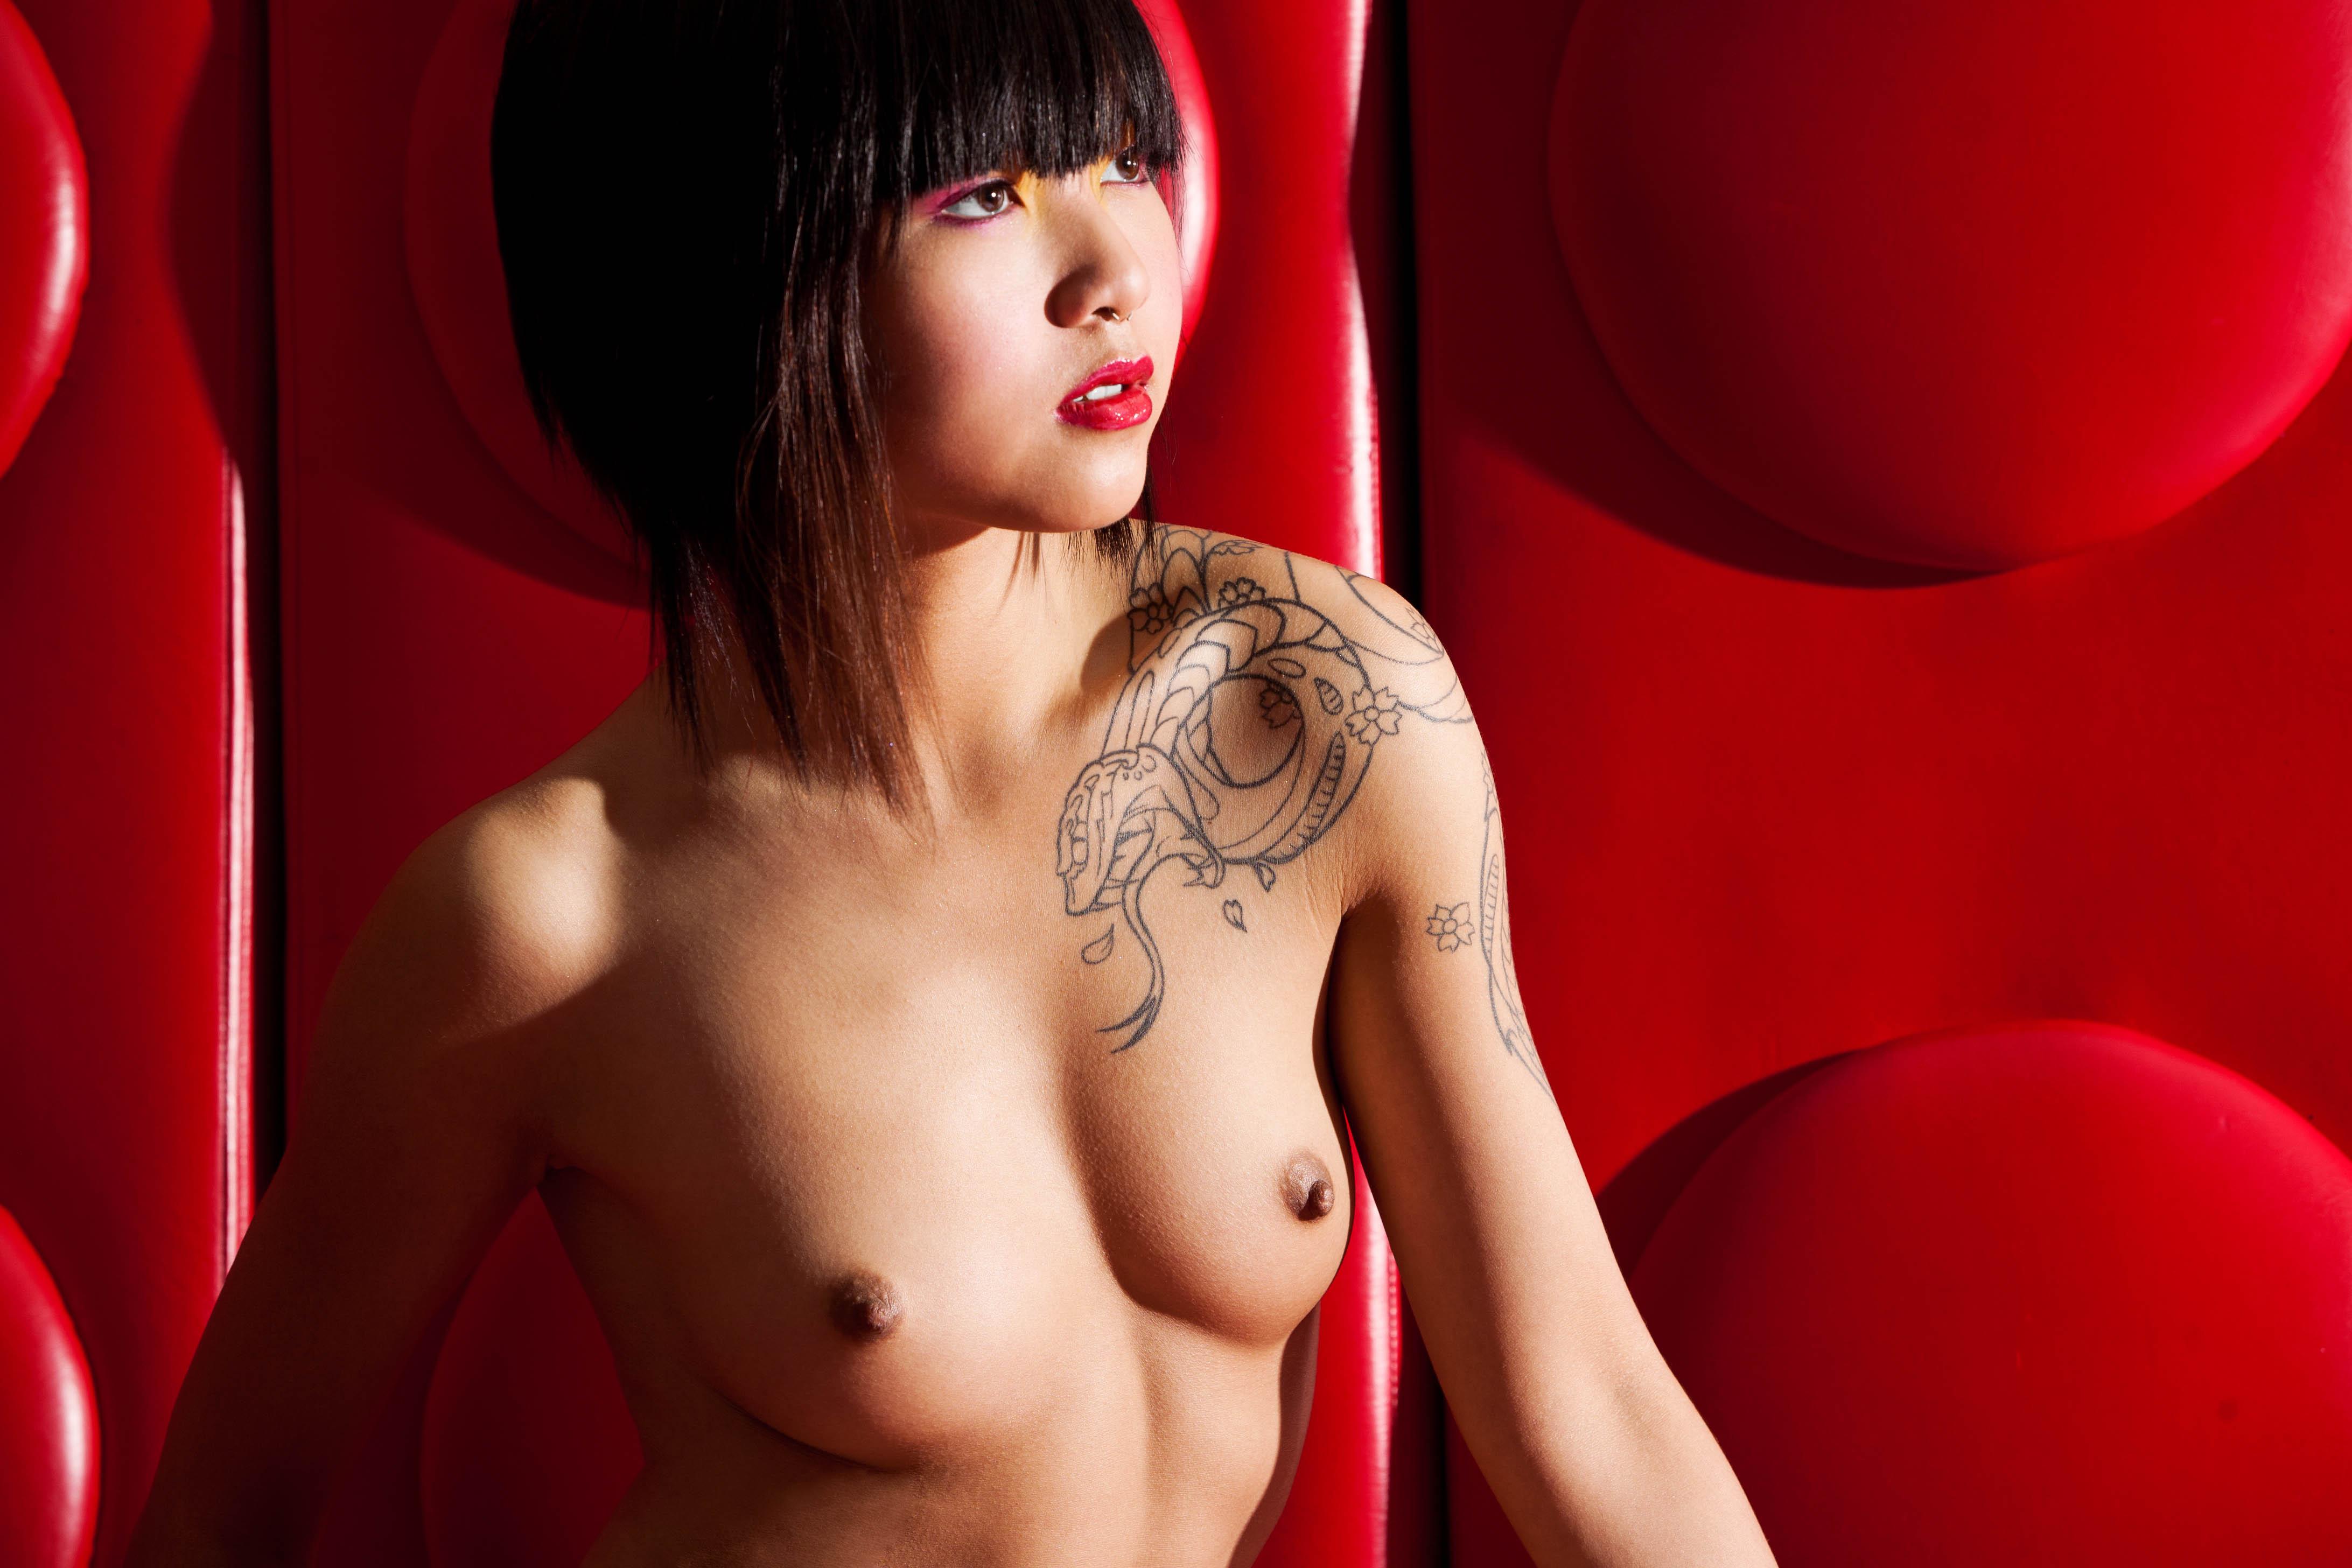 Mature naked vietnamese blonde